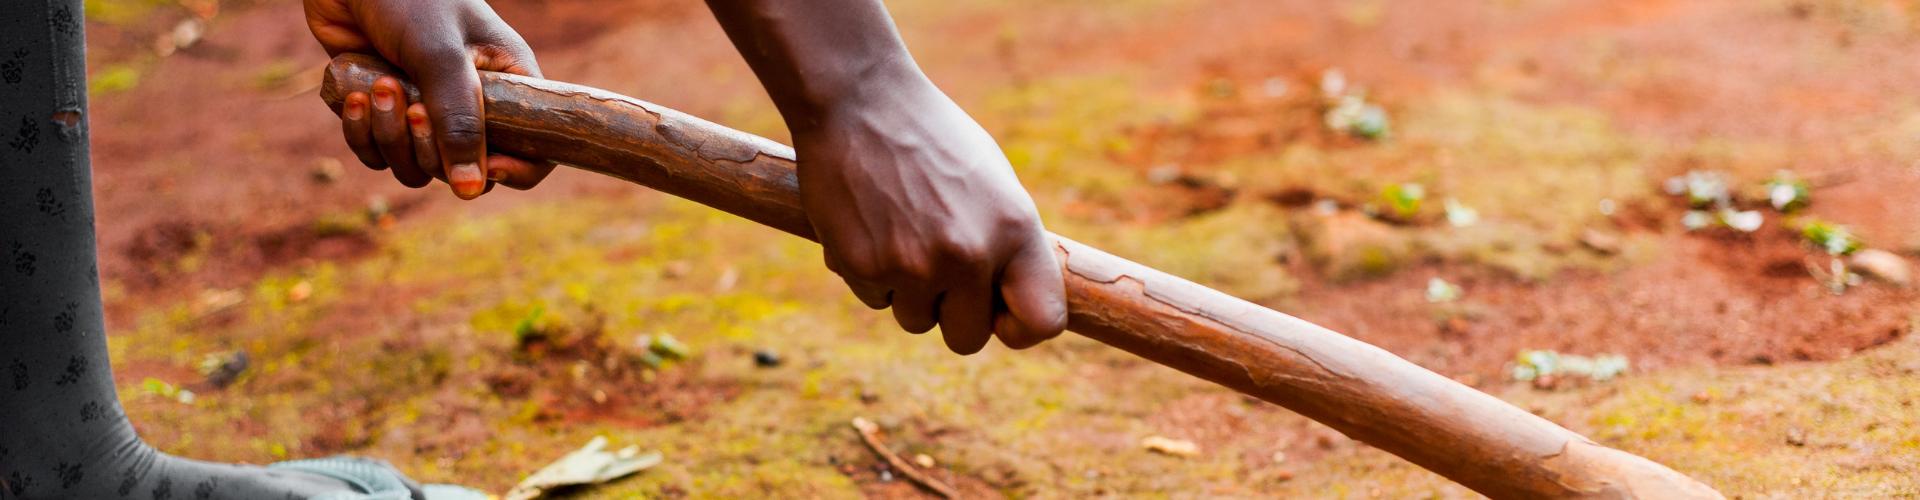 hand holding wood